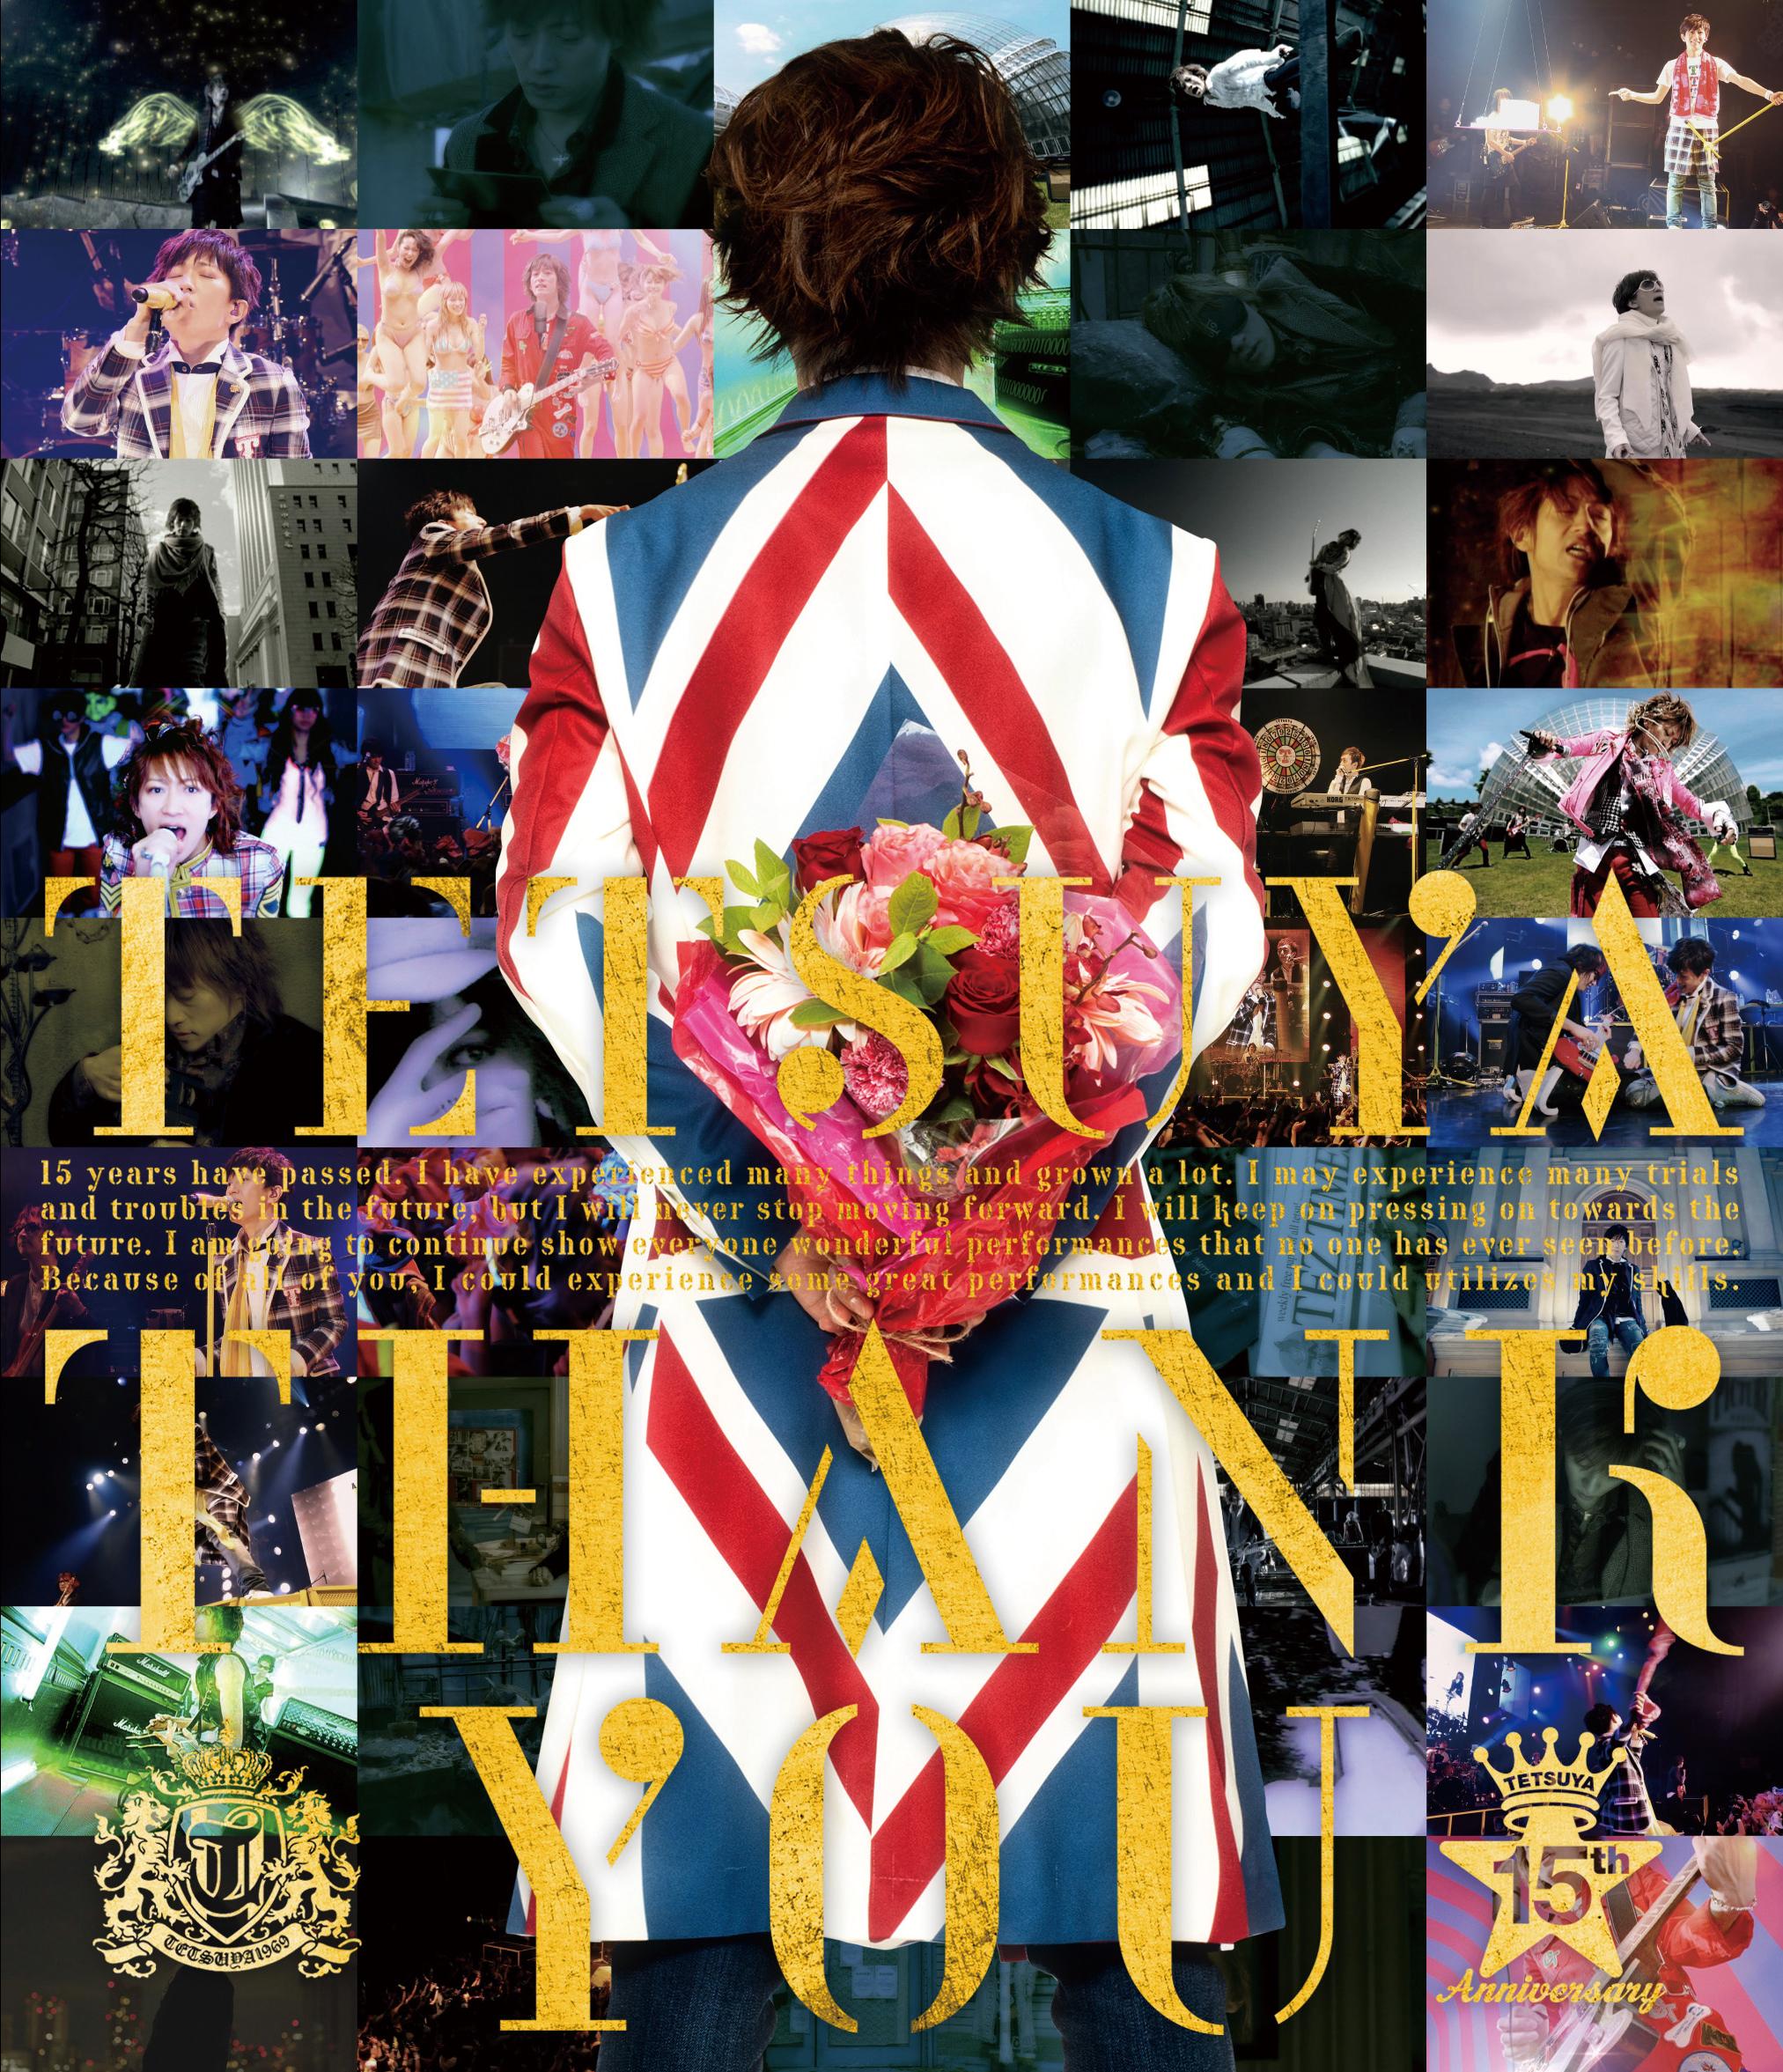 【Blu-ray】THANK YOU+WIZY限定 撮り下ろしPhotoBook 「THANK YOU」(集合写真撮影会:8/26公演)の画像